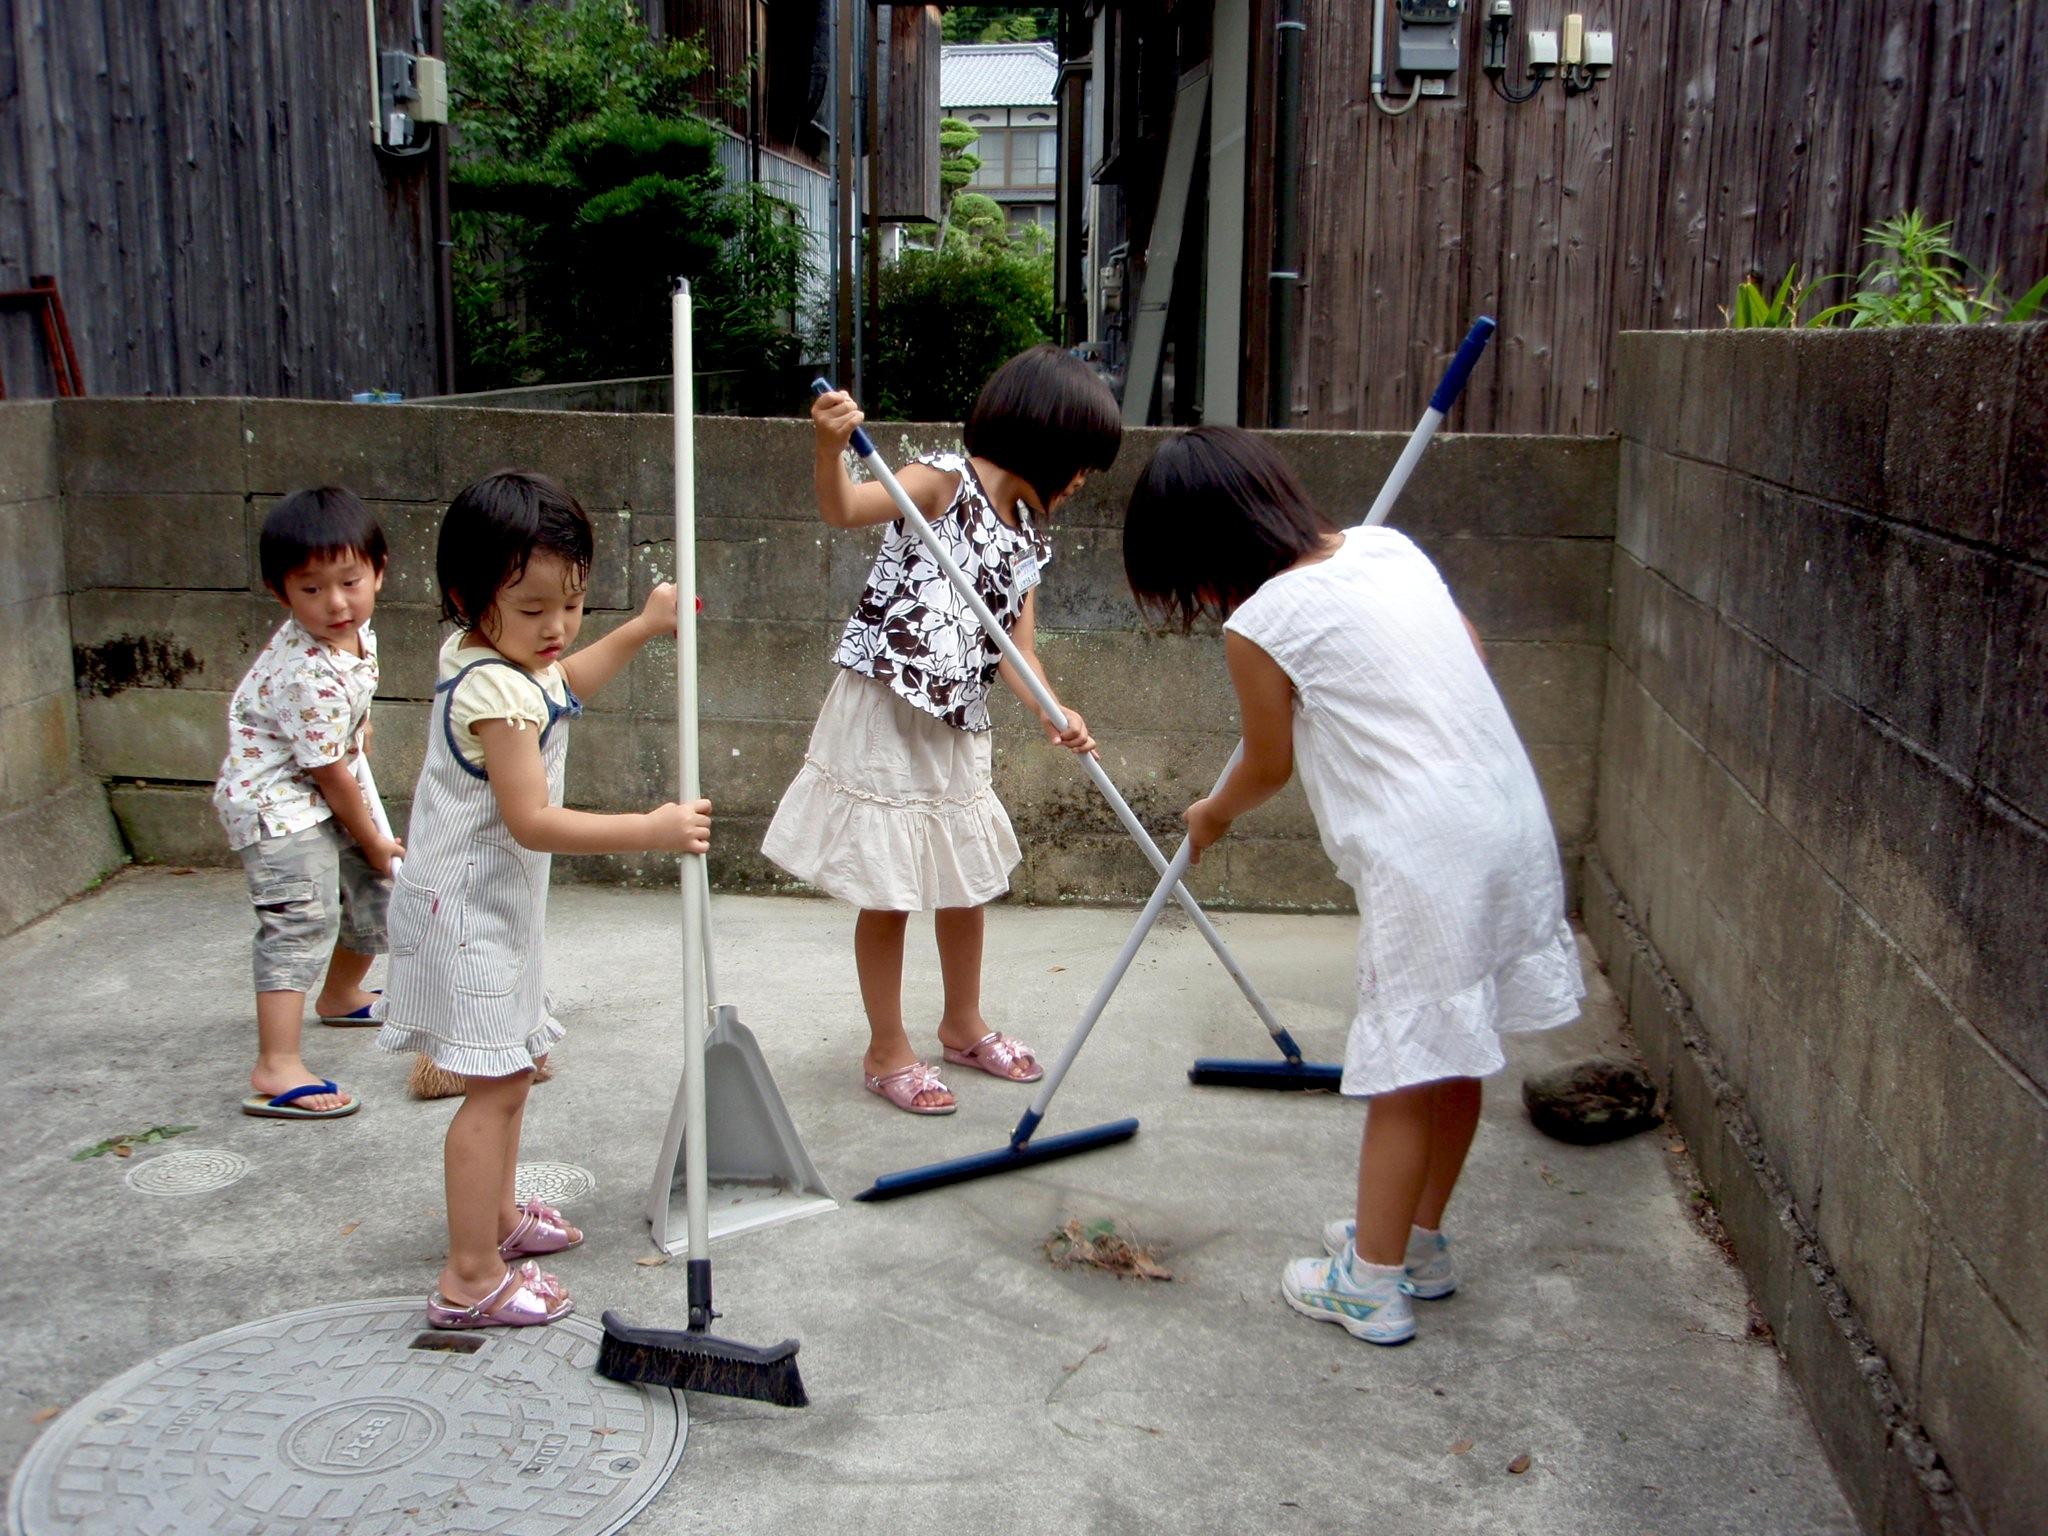 تمیز کردن مدارس ژاپنی بدست محصلان